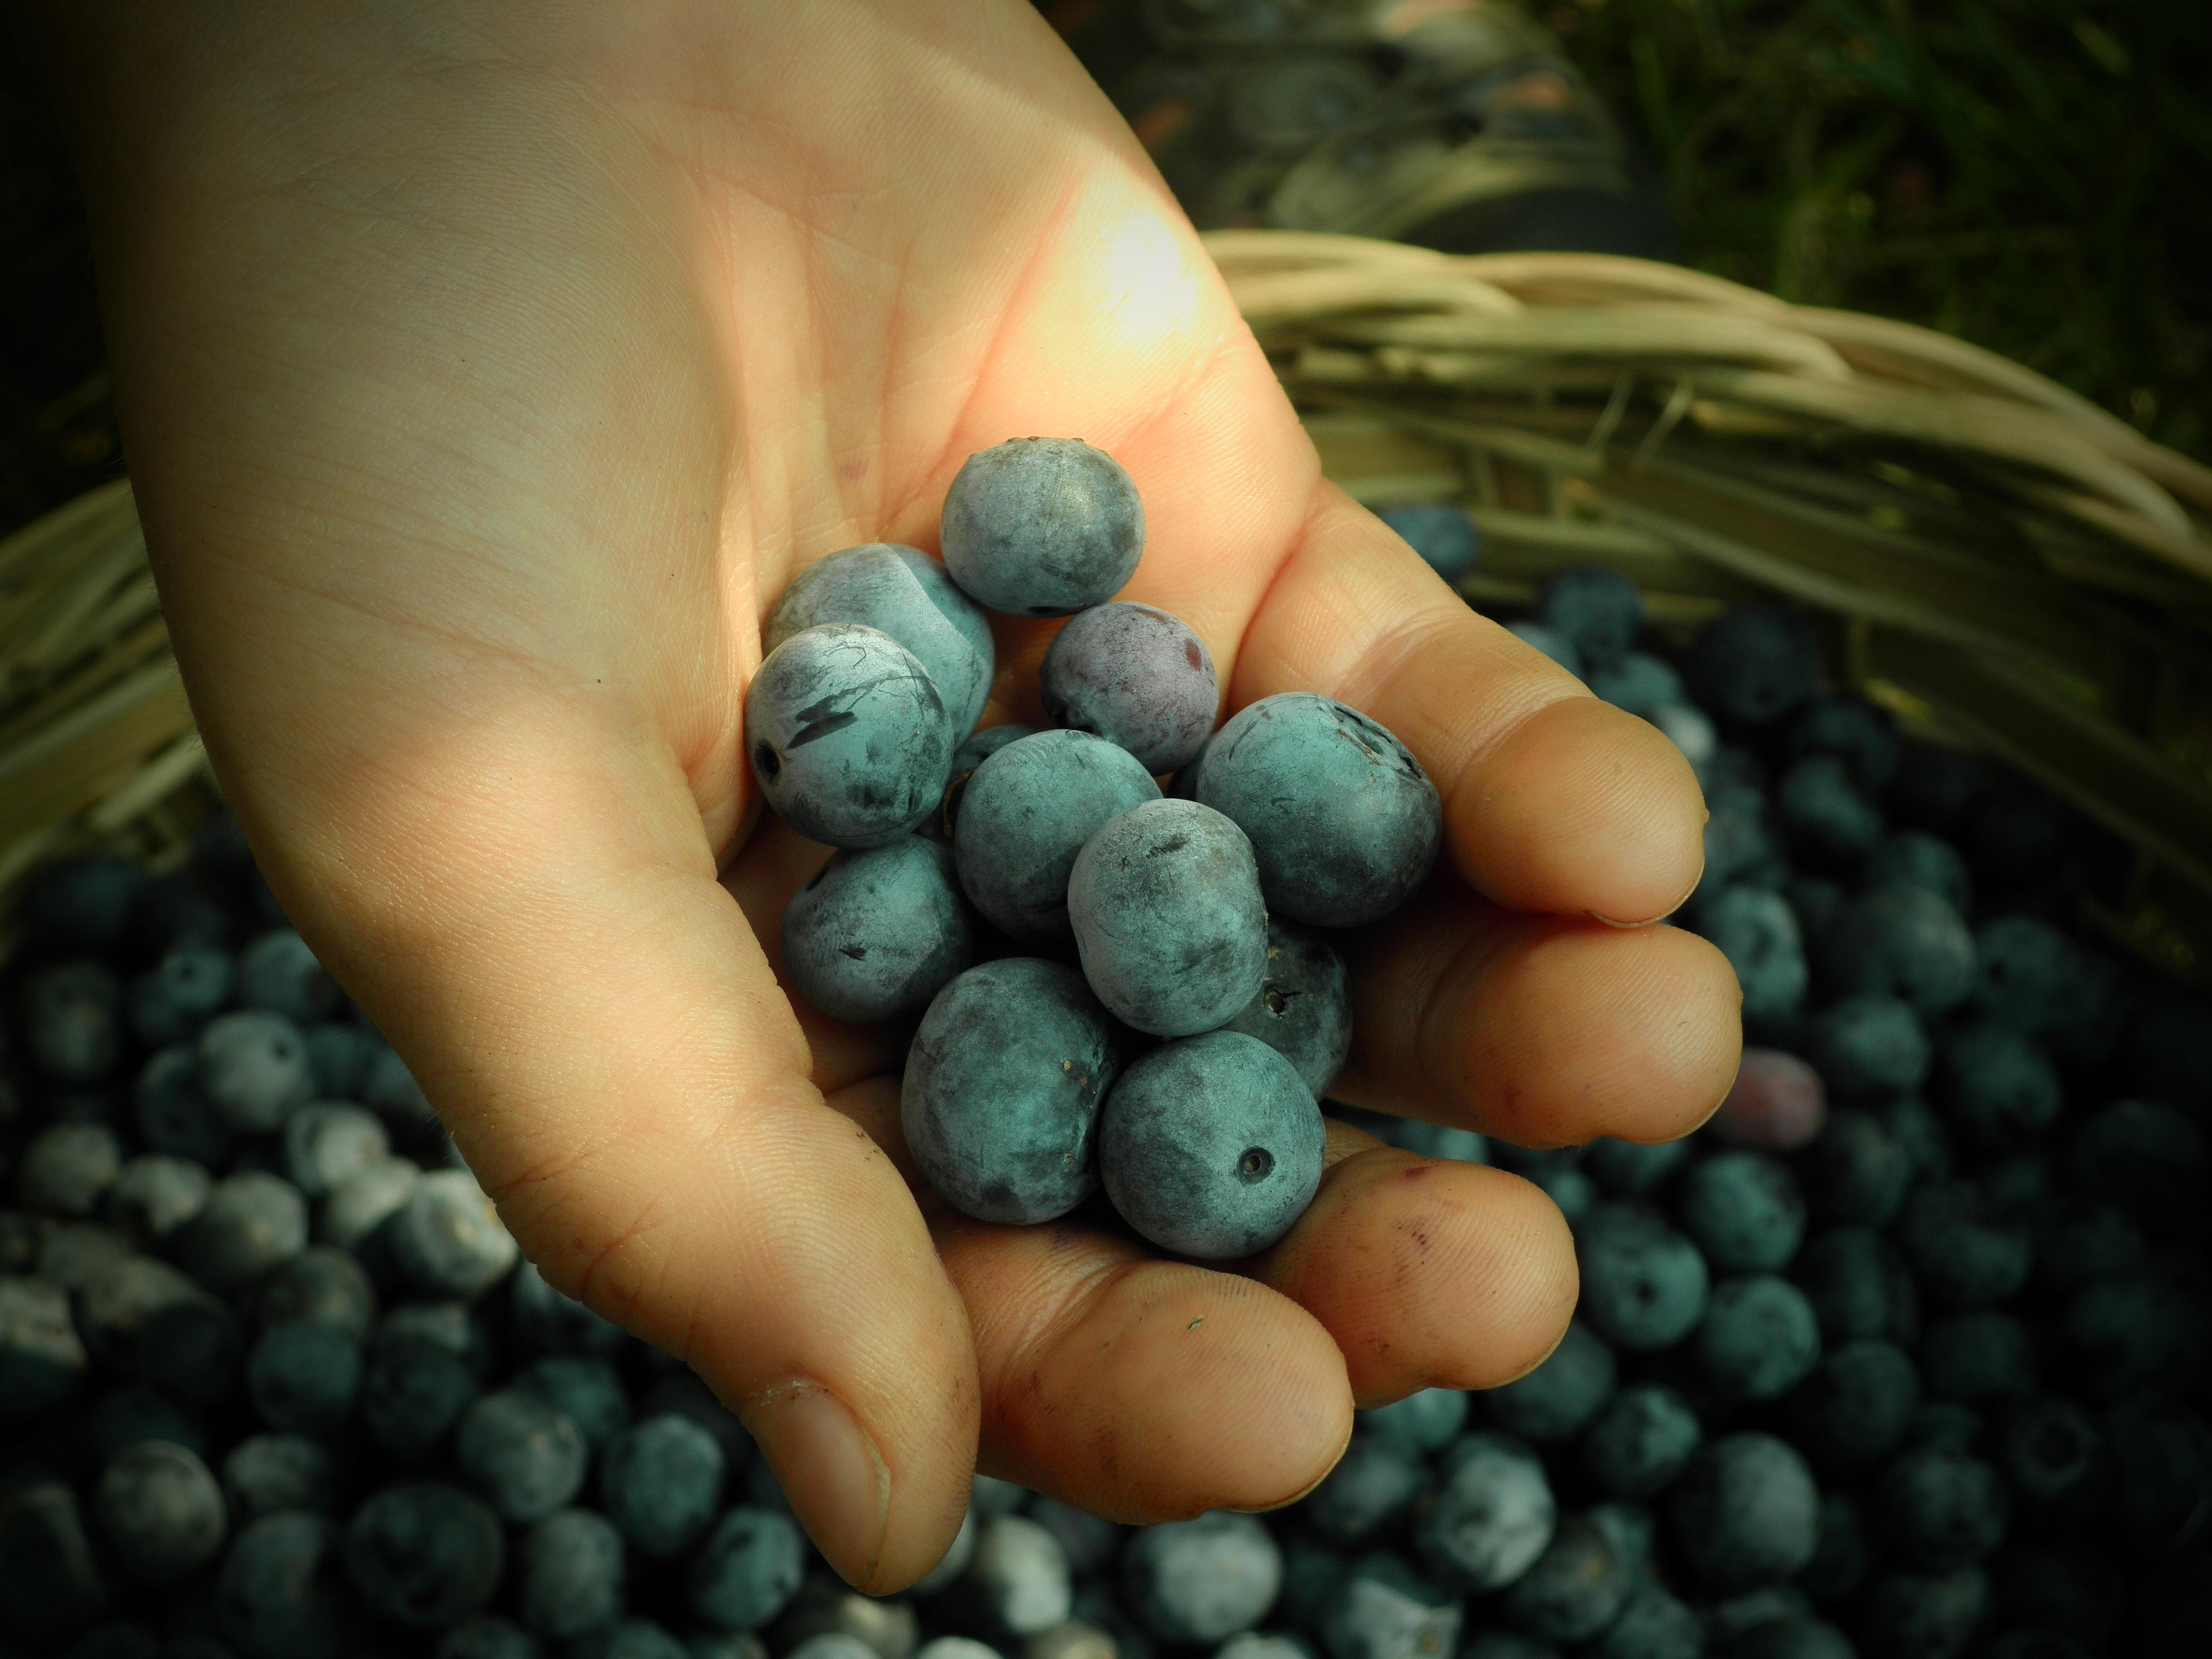 Blueberry_zucchini_bread_recipe_from_Andrew_G_Gordon_Inc_Insurance